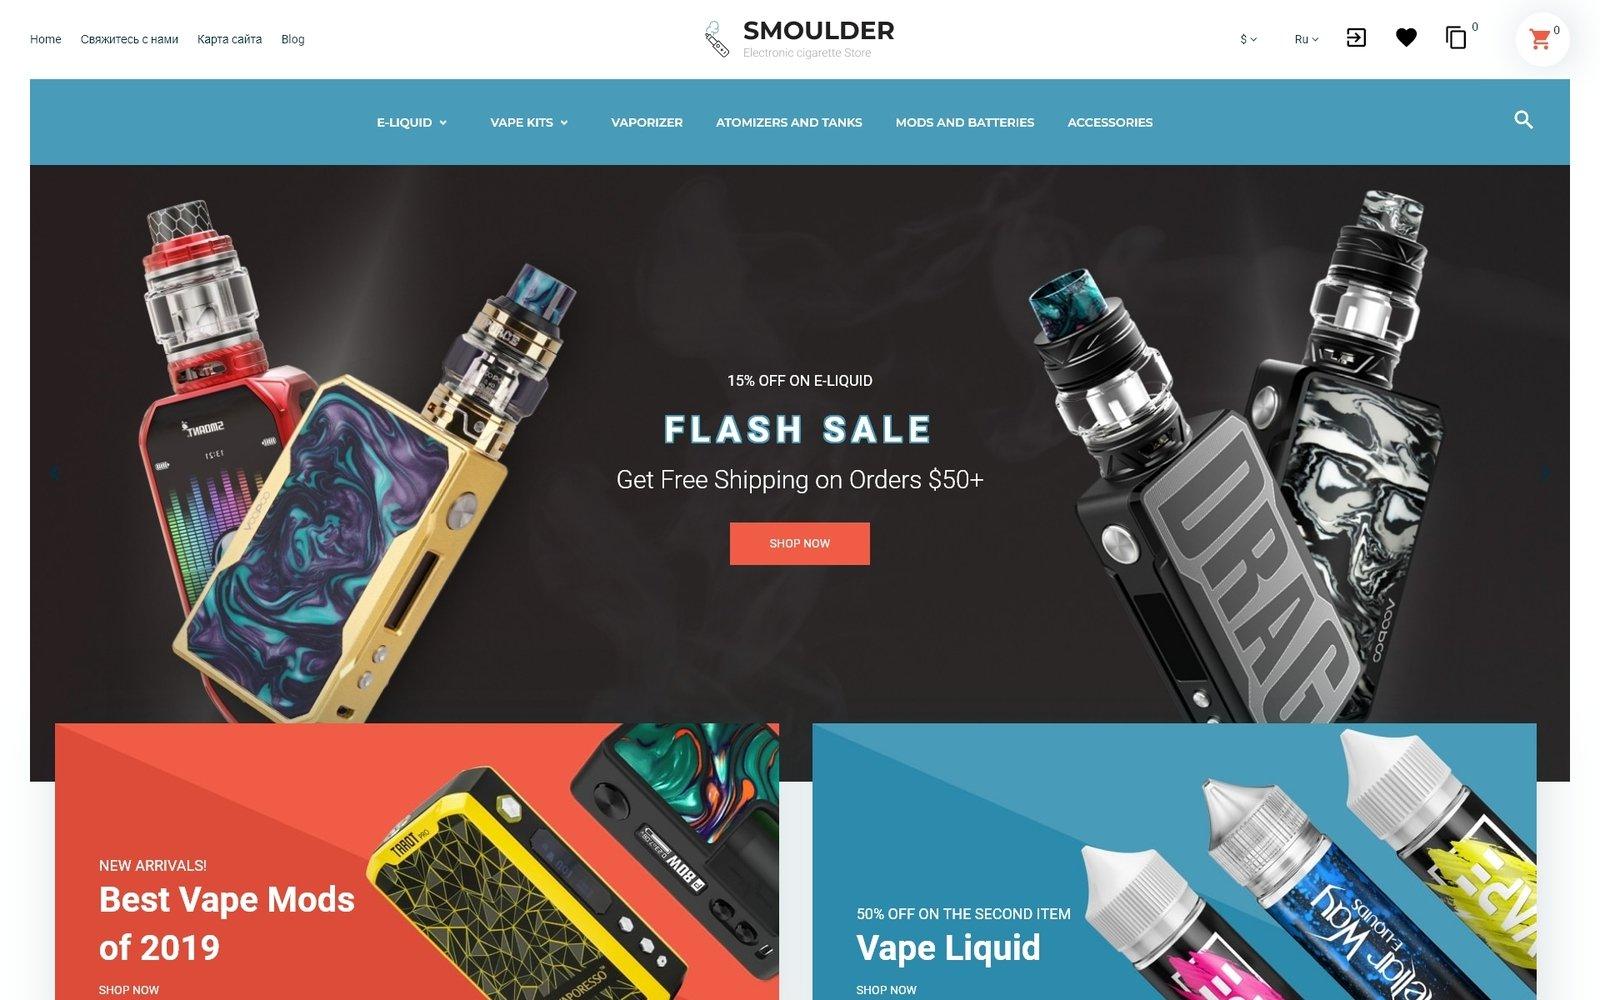 Responsivt Smoulder - E-cigarette Website Design PrestaShop-tema #92990 - skärmbild